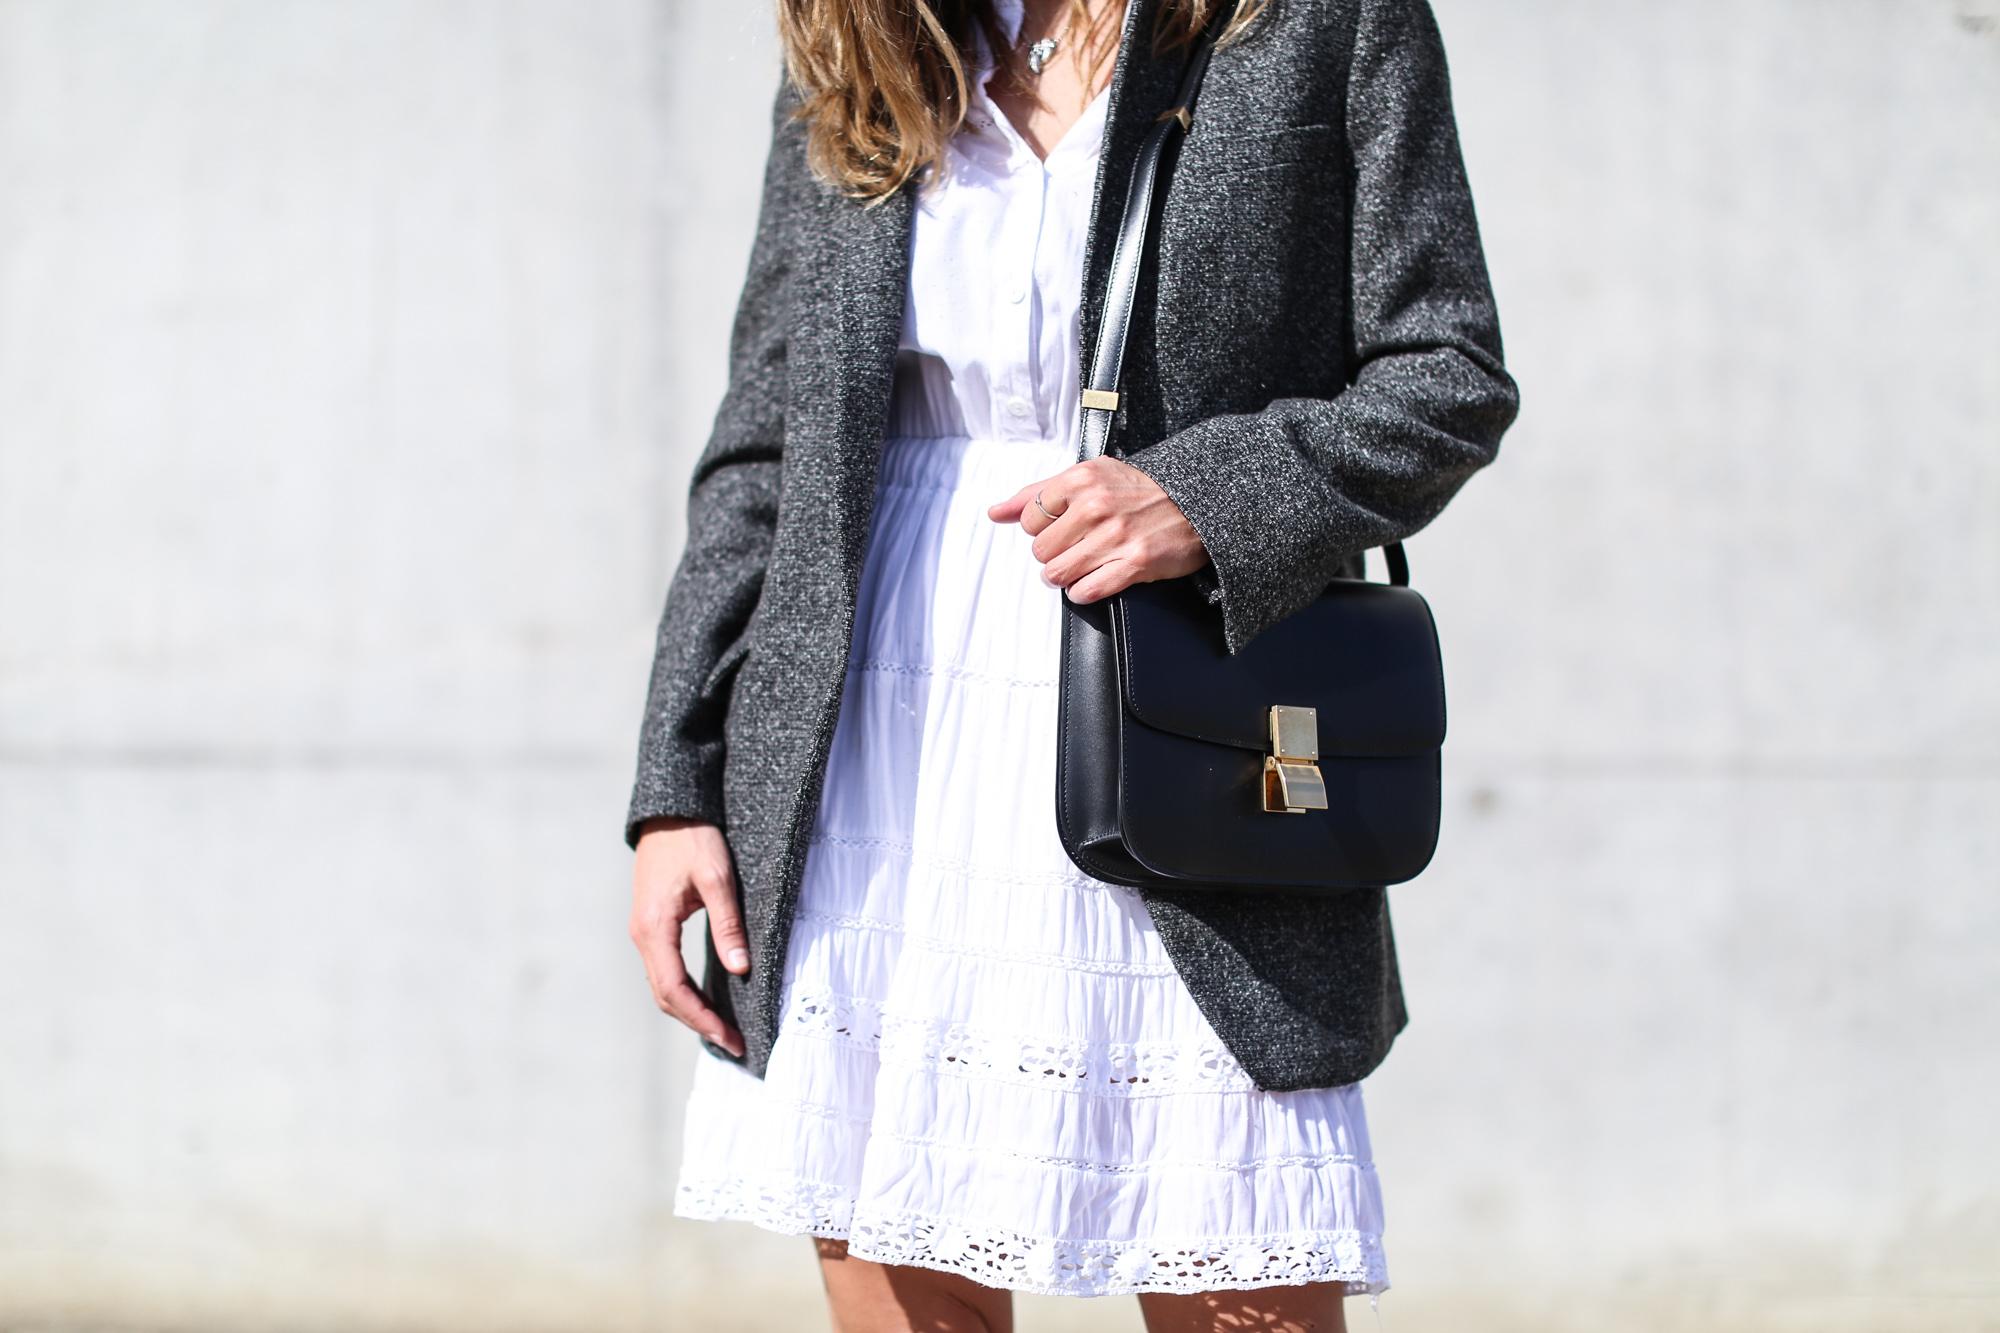 Clochet_streetstyle_fashionblogger_botinesdickerisabelmarant_celineboxbag-5